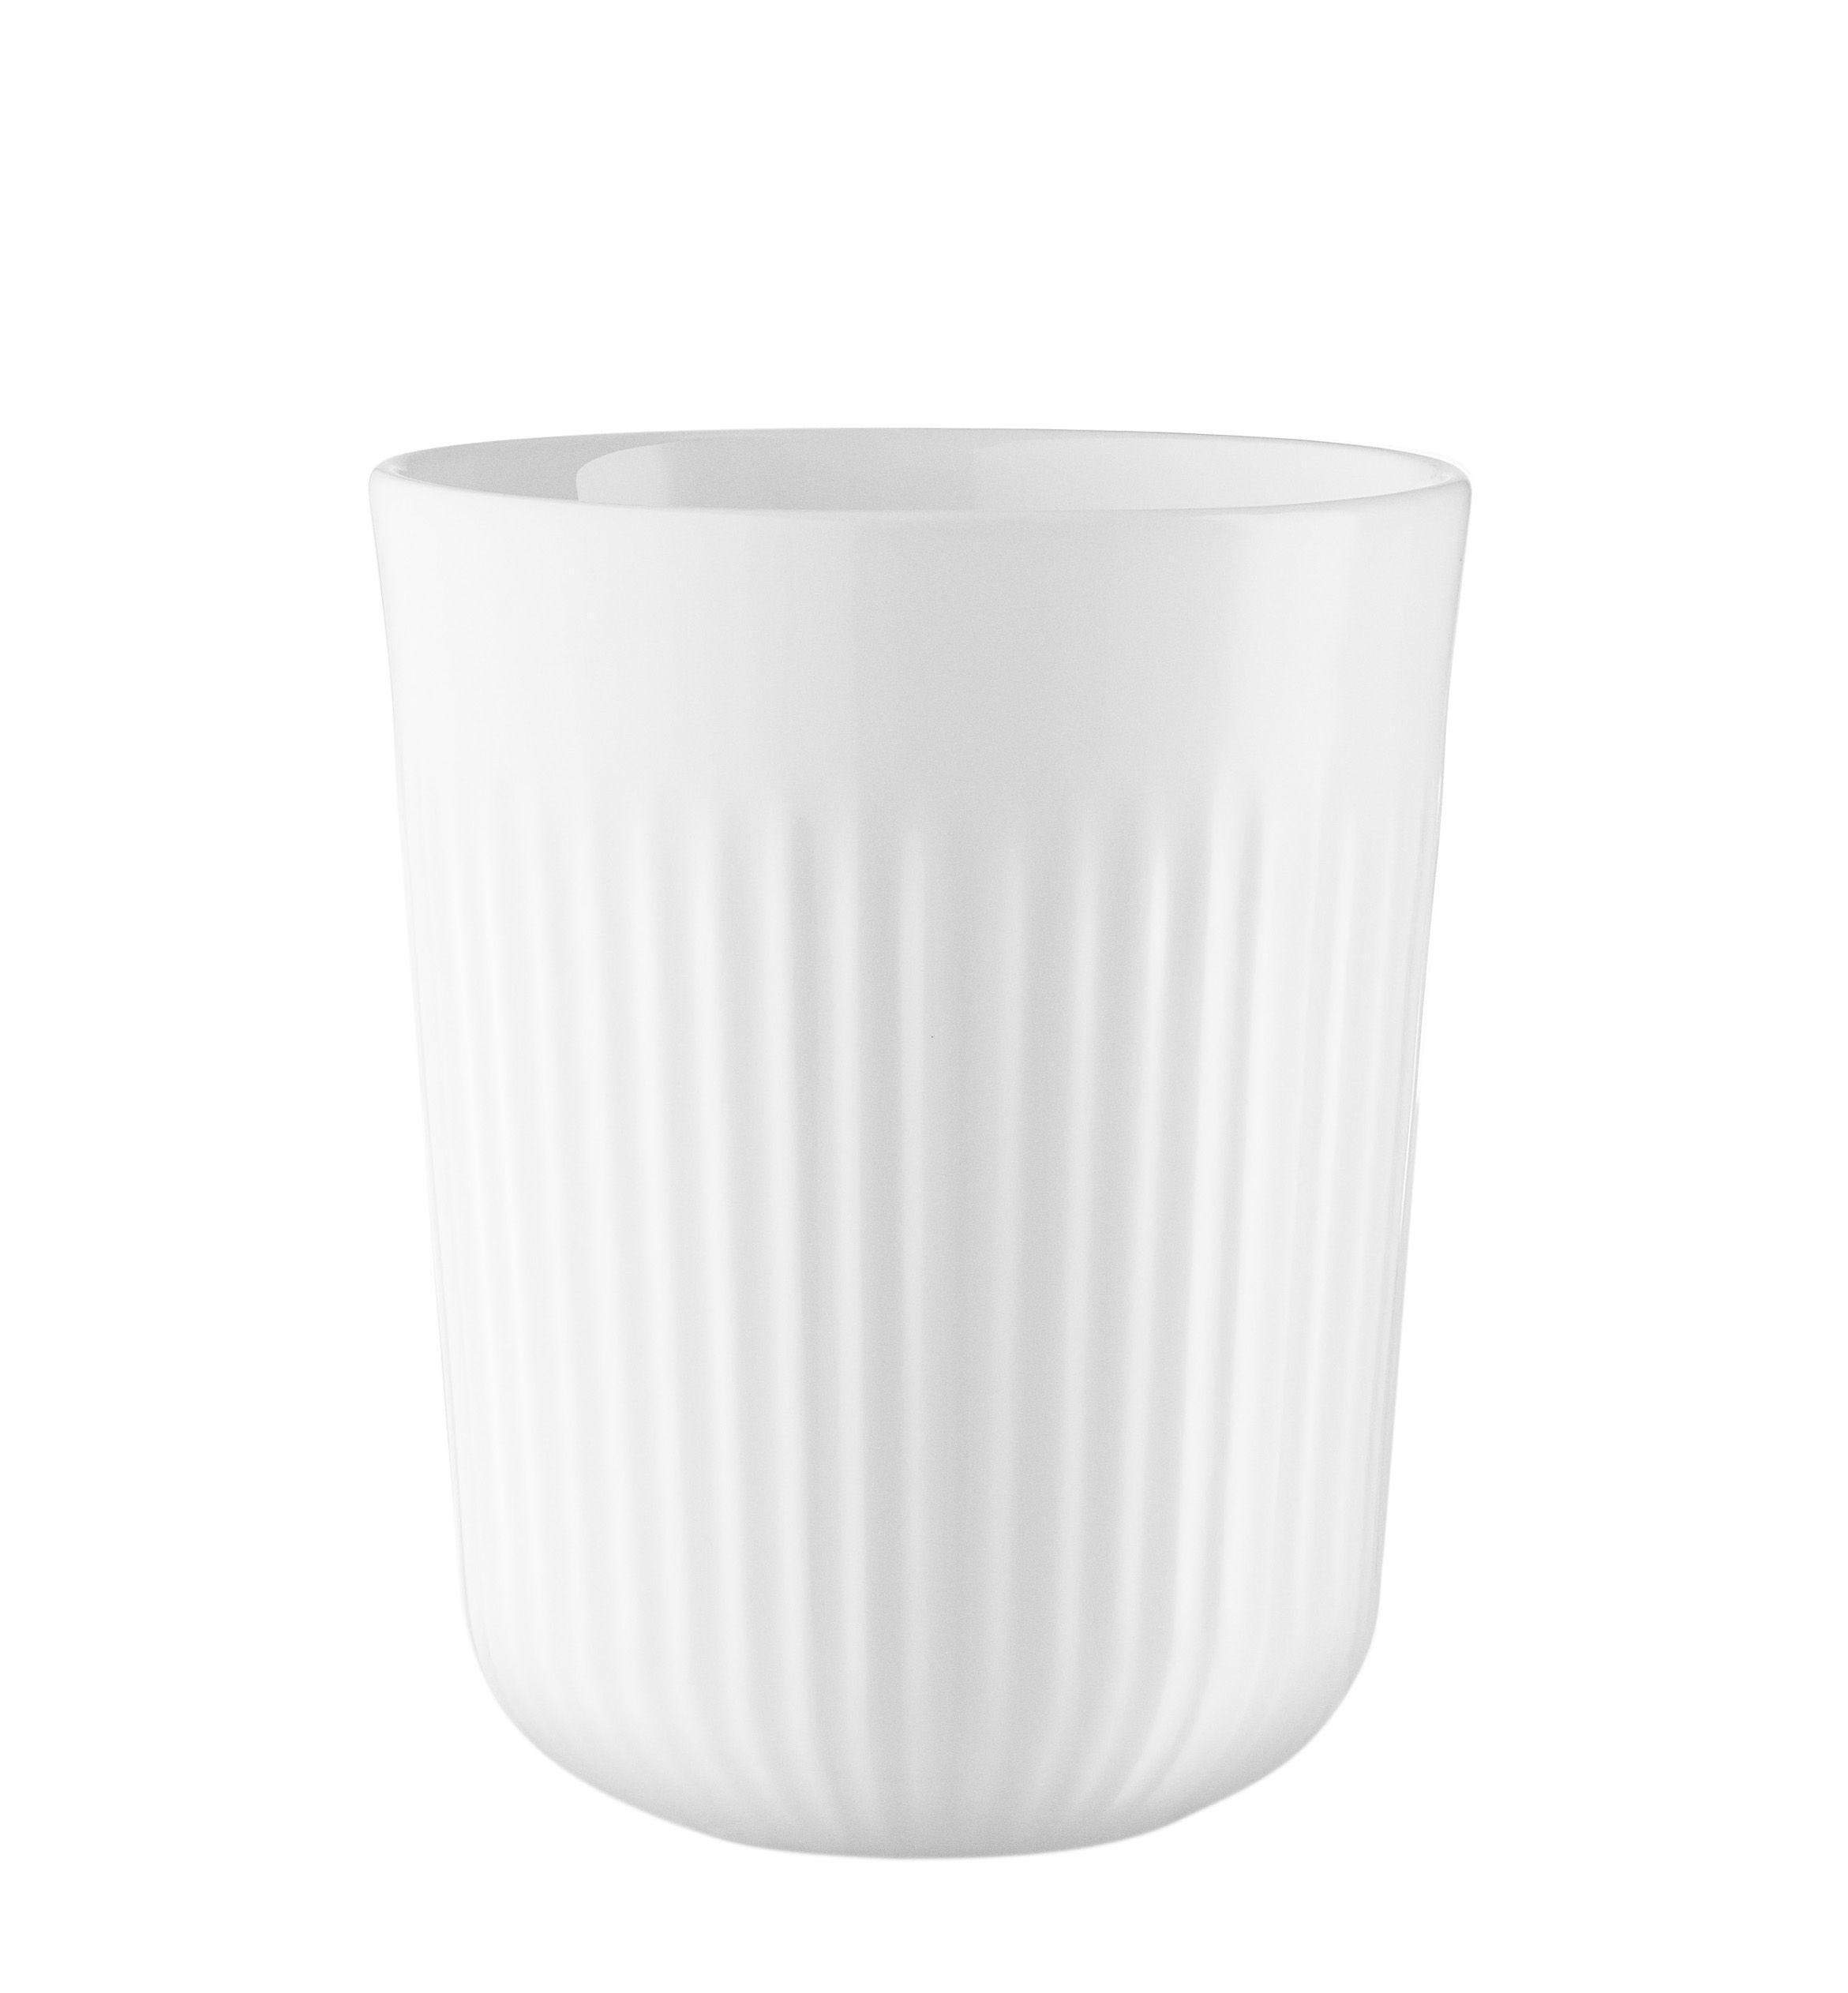 Arts de la table - Tasses et mugs - Mug isotherme Legio Nova / 31 cl - Eva Trio - Blanc - Porcelaine